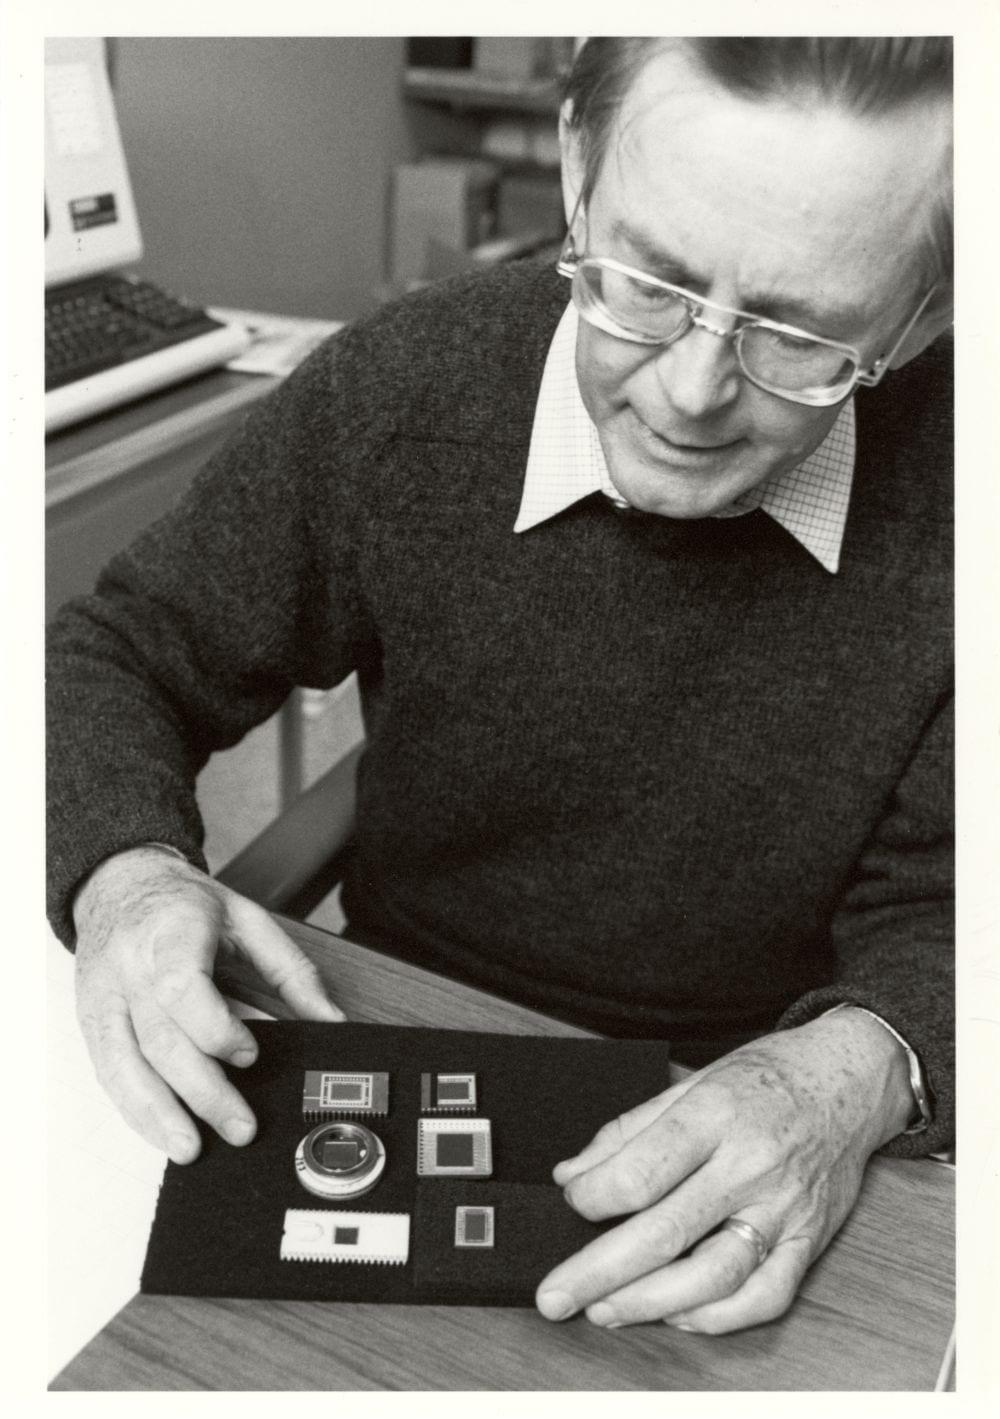 Developed First Digital Detector